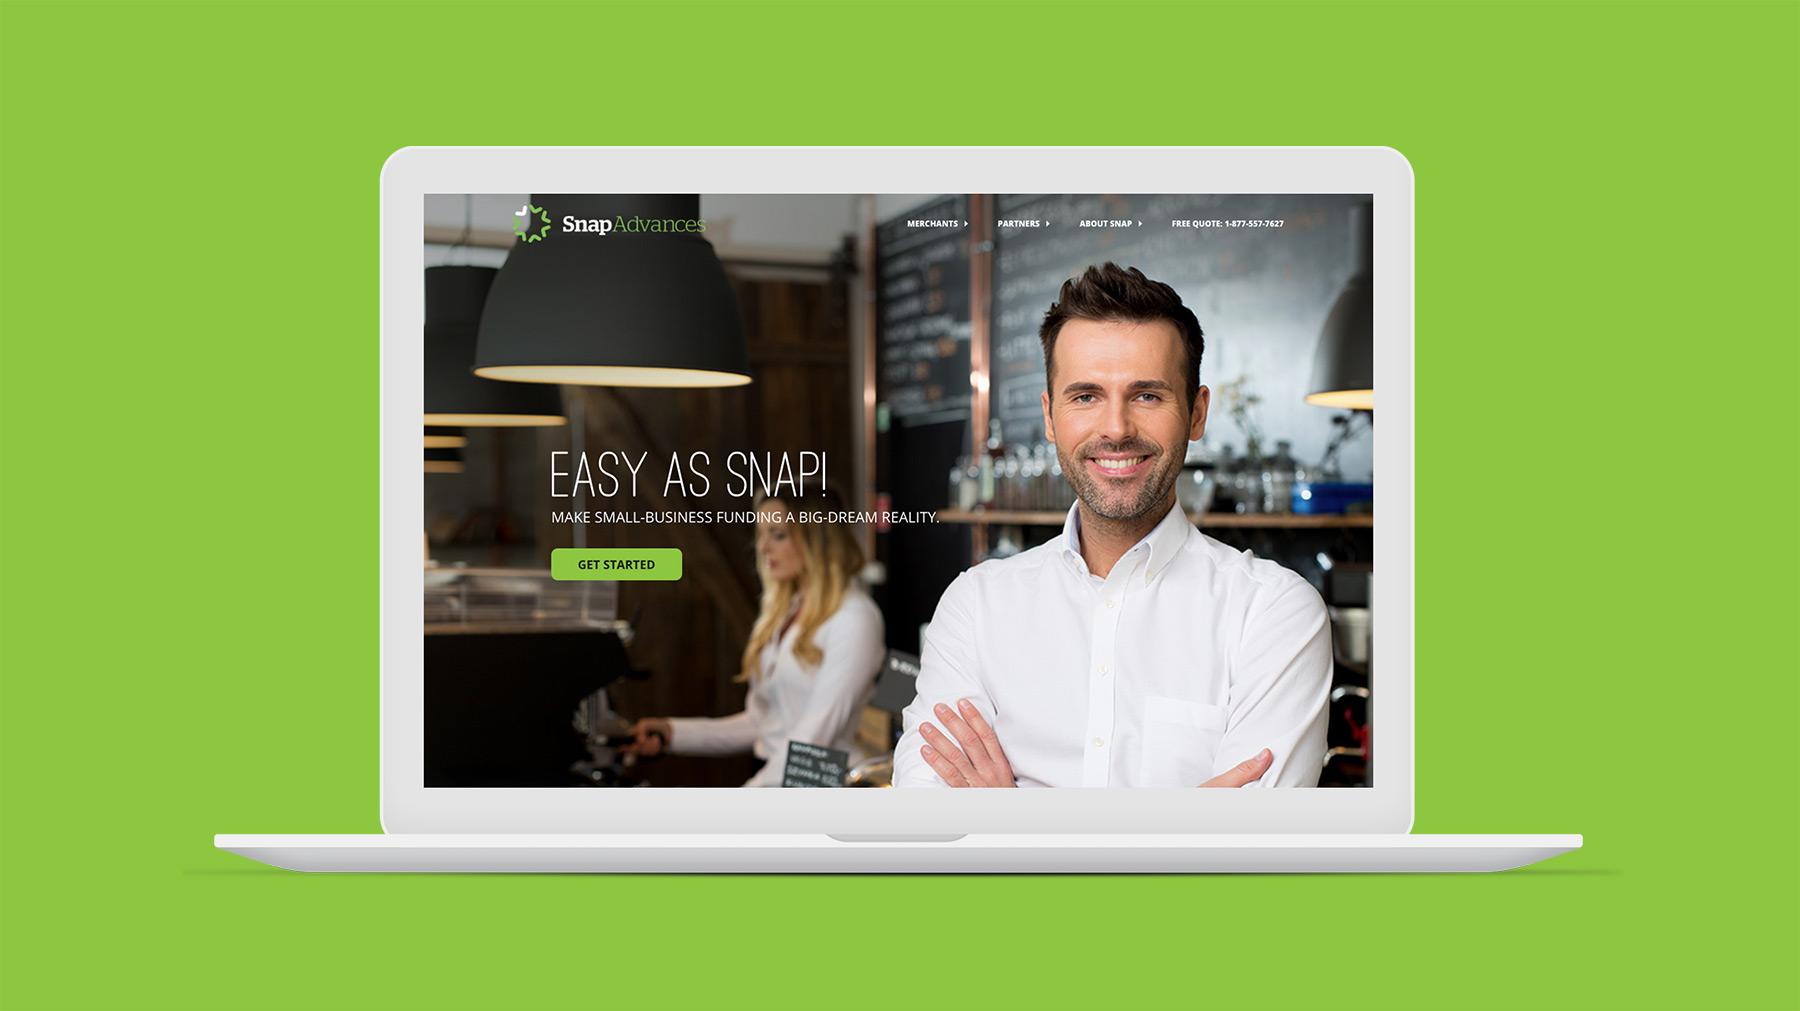 Snap Advances website homepage on laptop screen